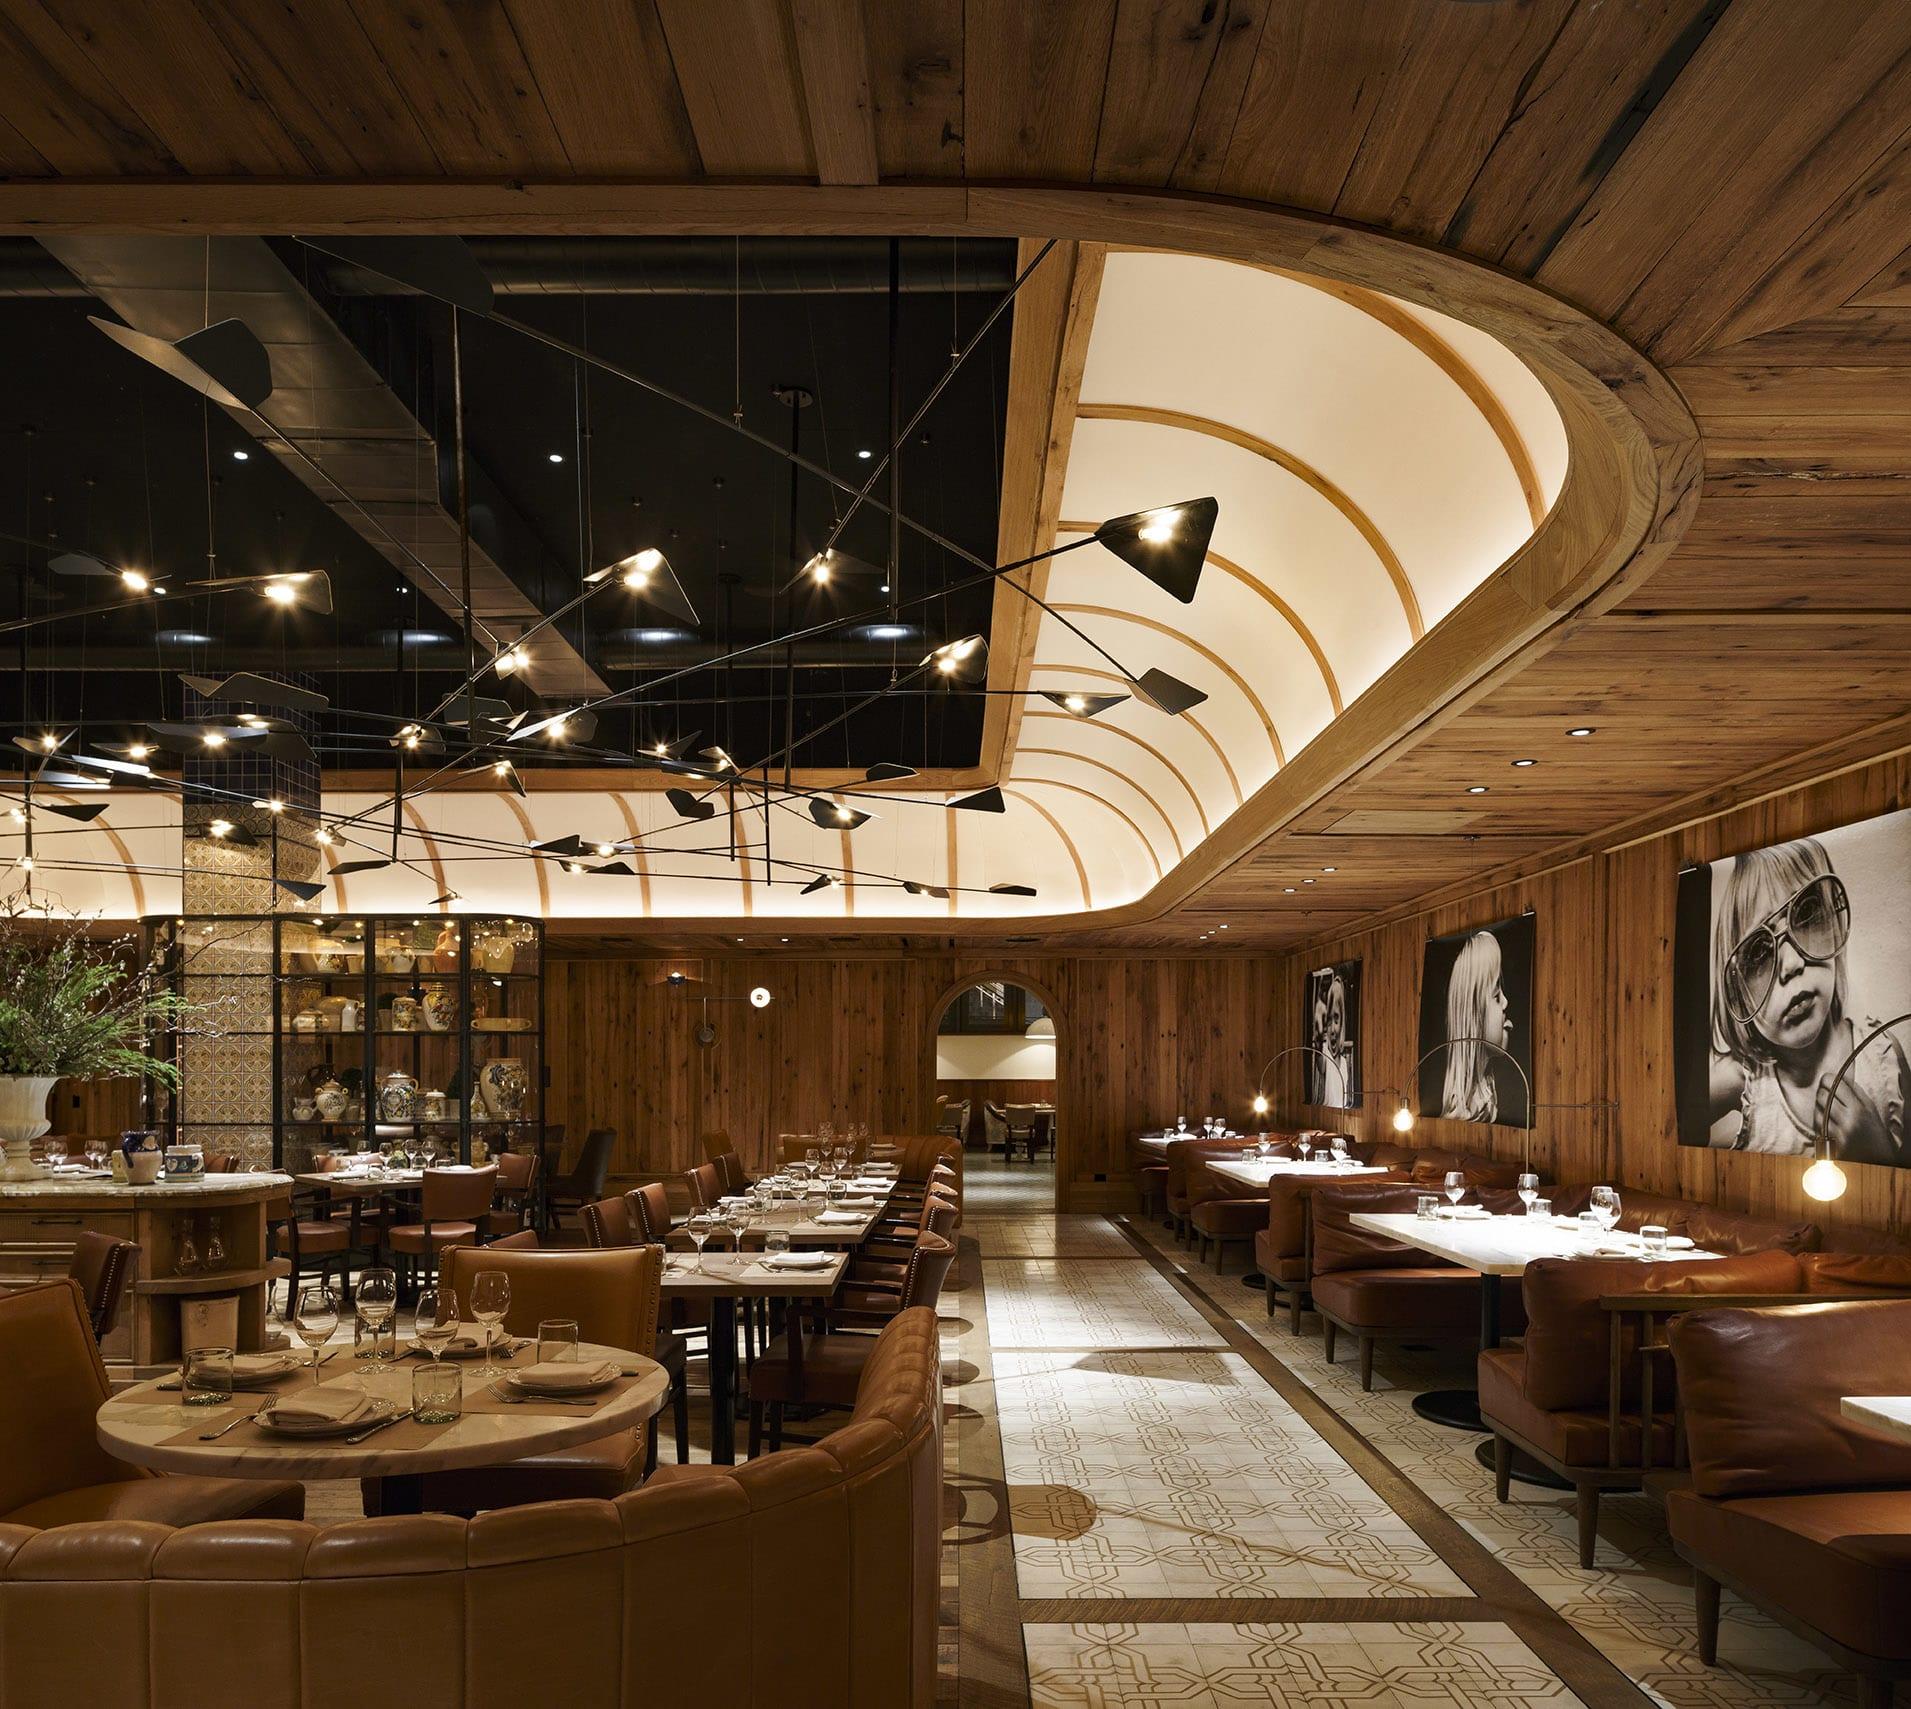 Interior Design by Studio Munge at Leuca, Brooklyn - Interior Design